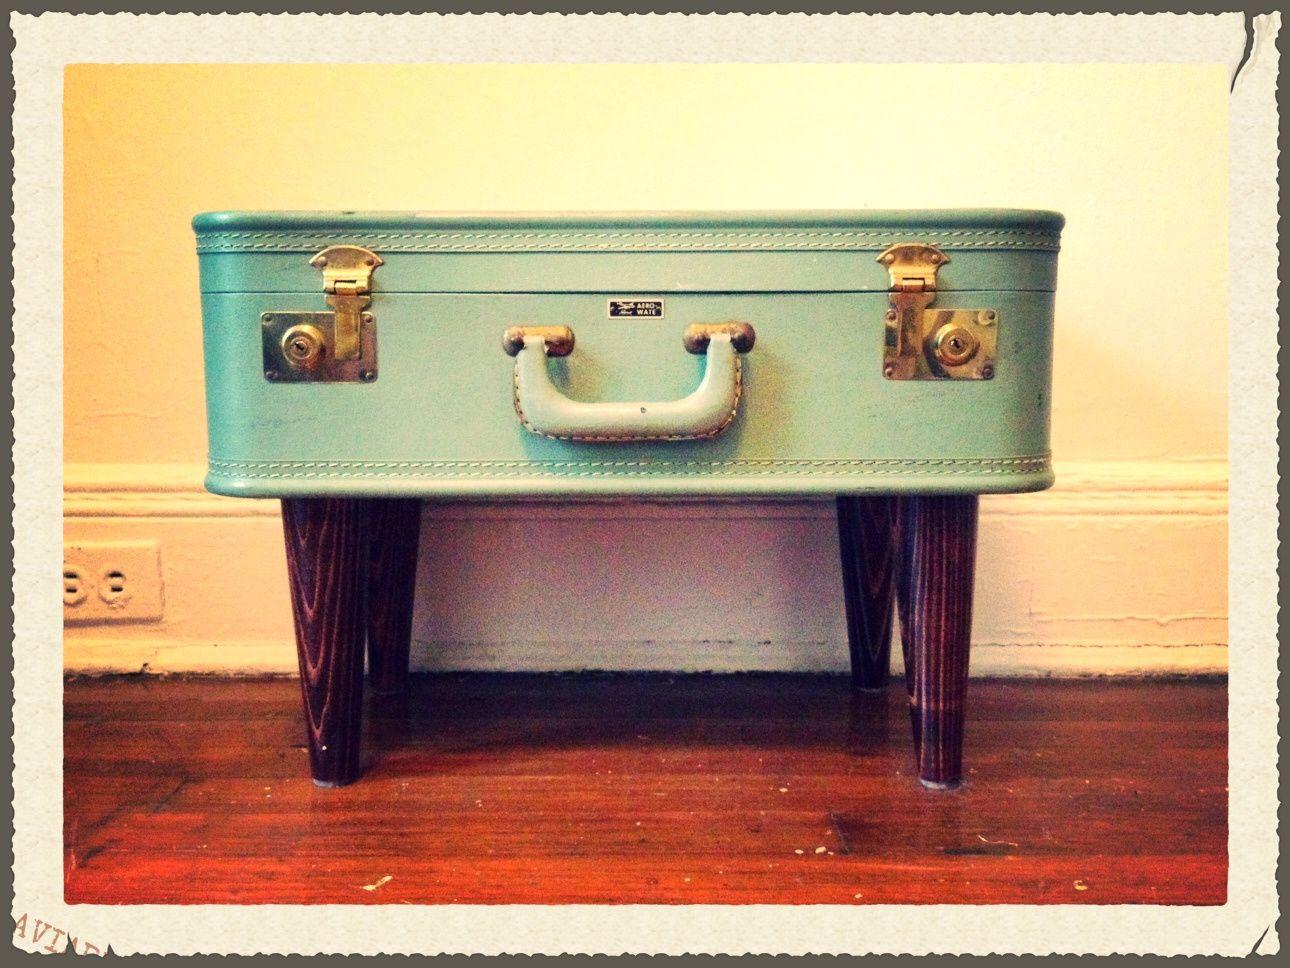 Diy suitcase table - Suitcase Dresser